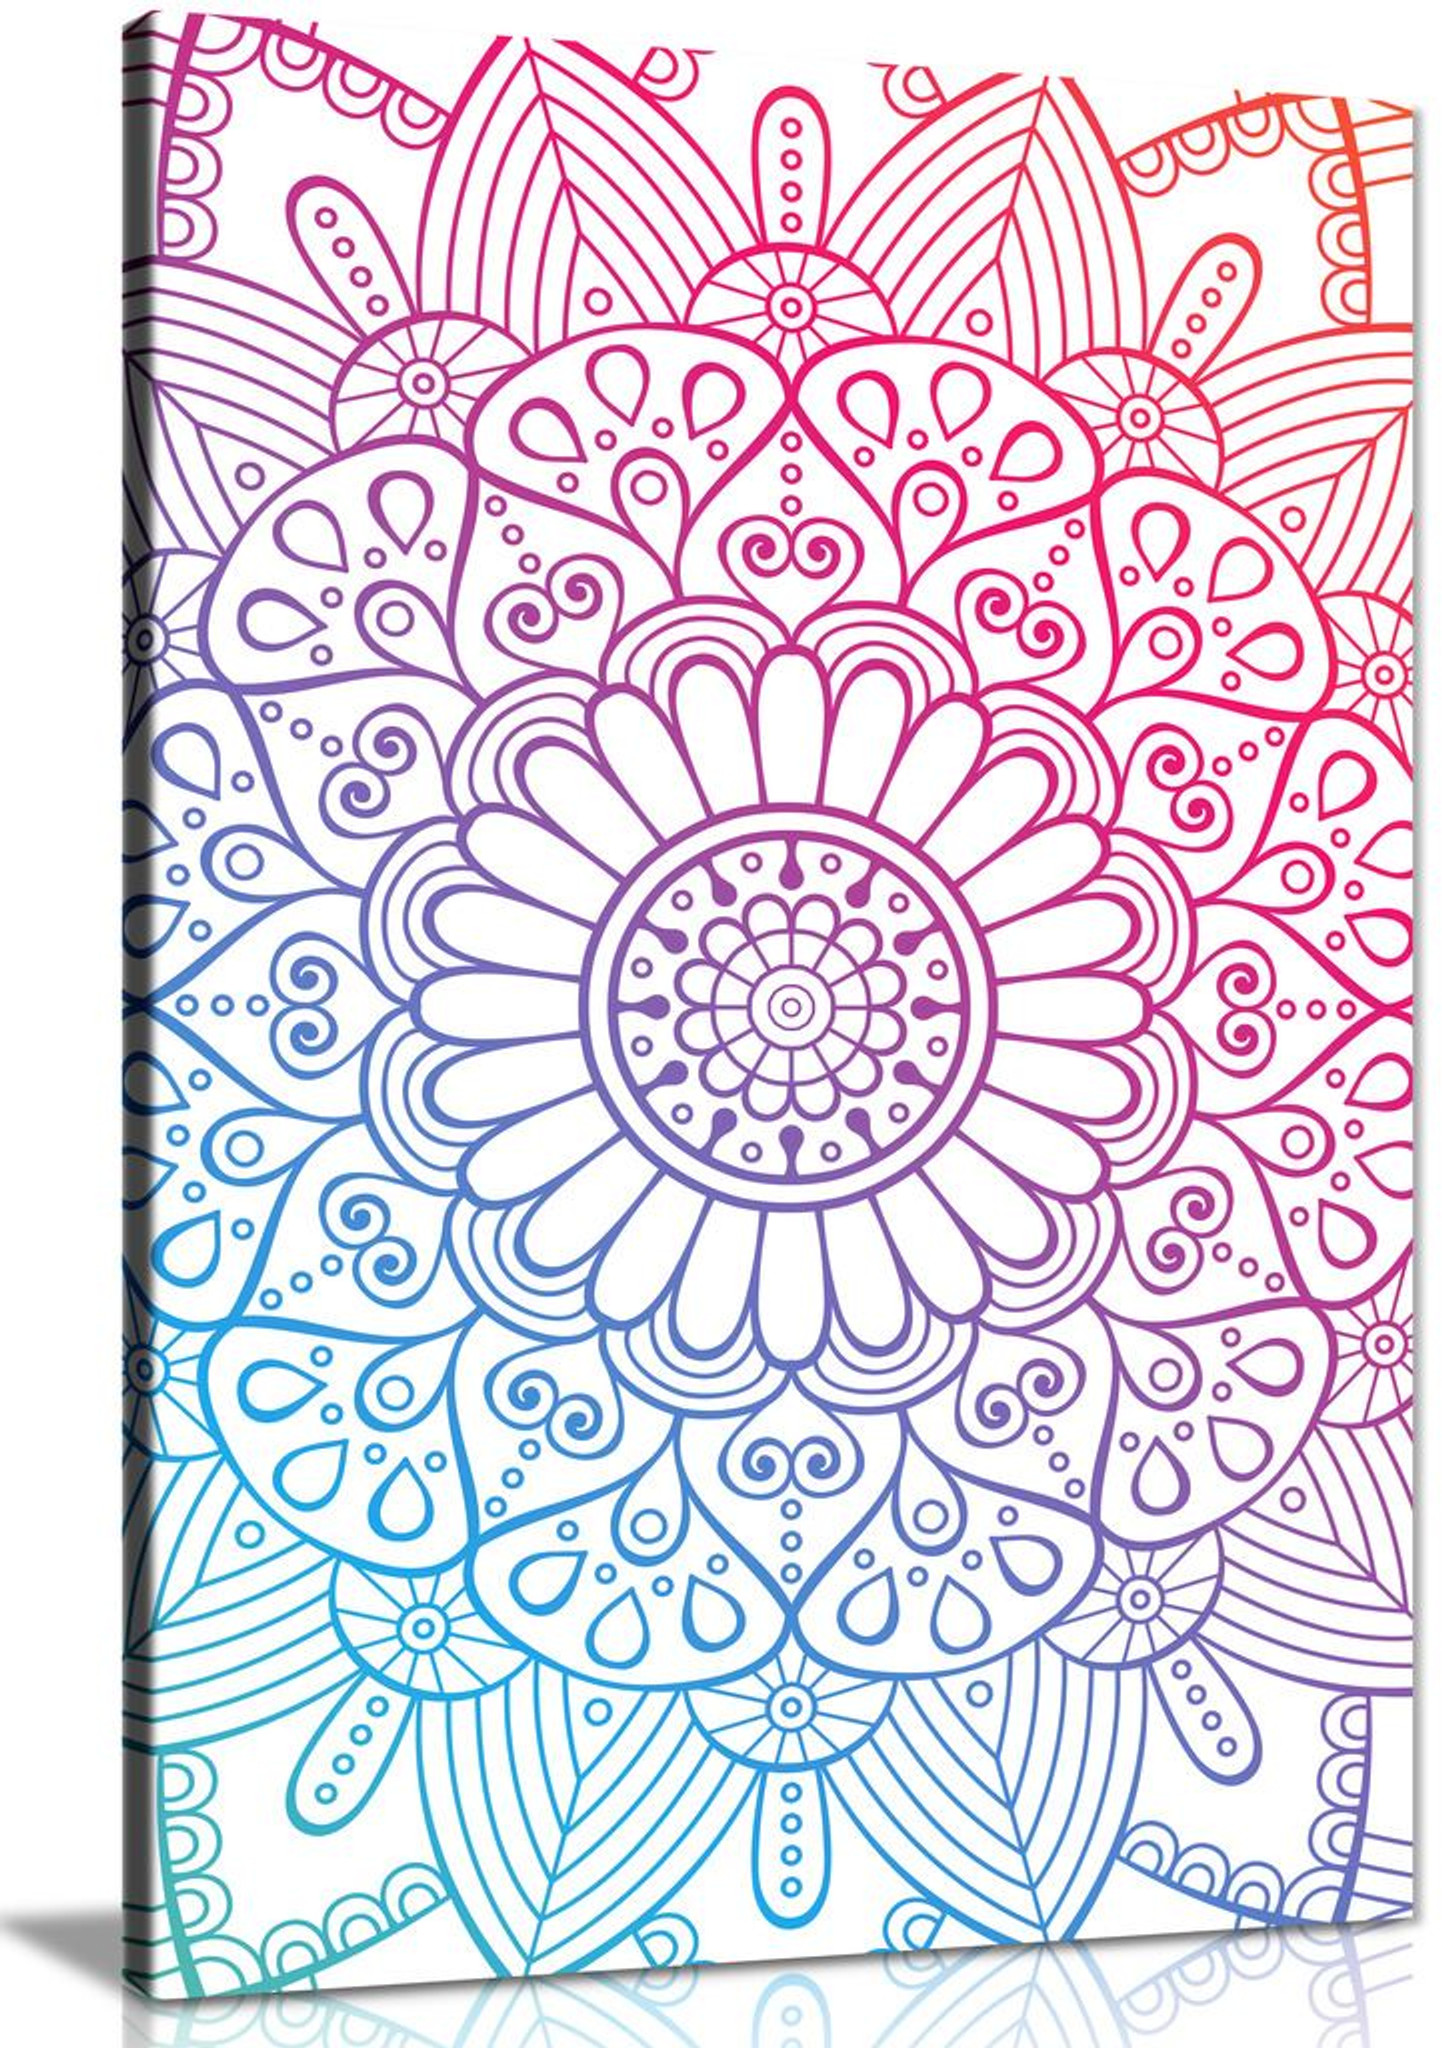 Abstract Mandala Spiritual Canvas Wall Art Picture Print